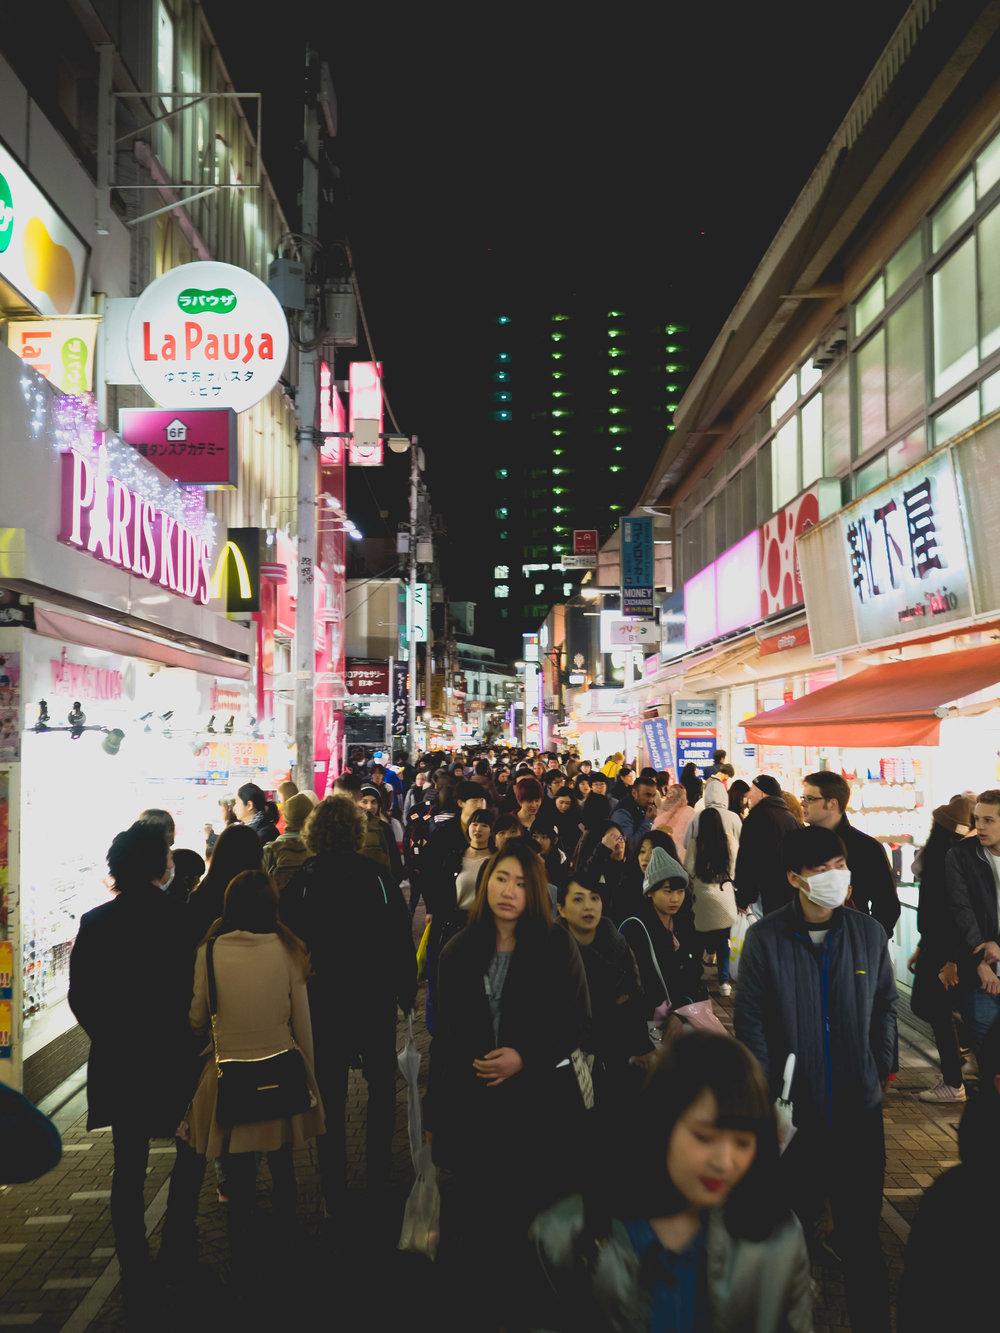 harajuku crowds.